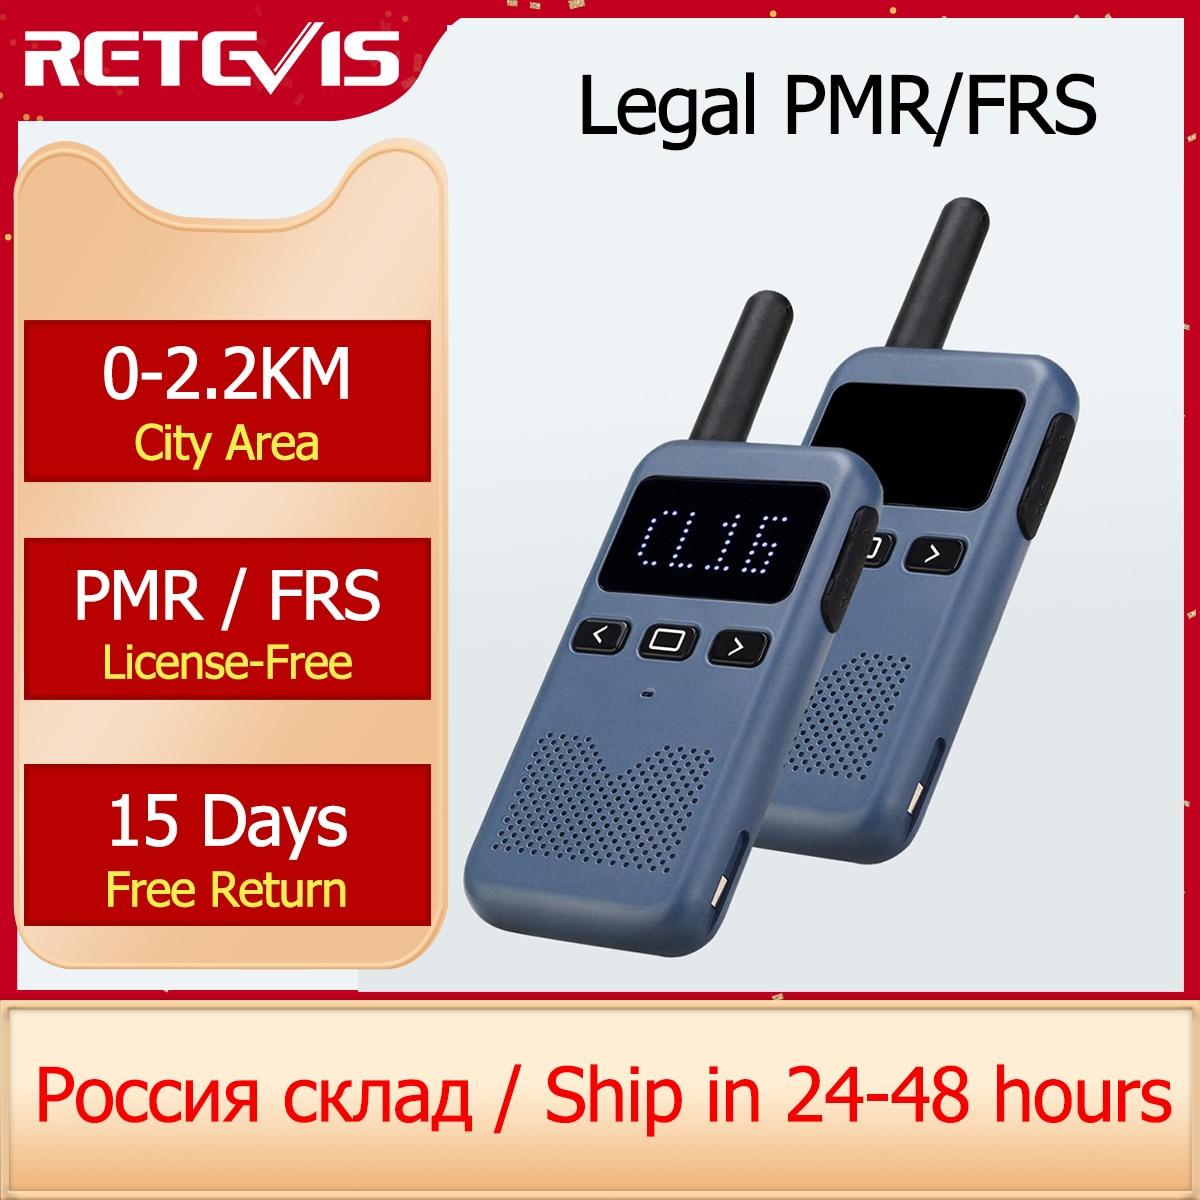 Walkie Talkie Mini Retevis USB Type C Телефон RB619 PMR 446 Радио Walkie-Talkies 1 или 2 шт двухстороннее радио портативное радио PTT Hotel